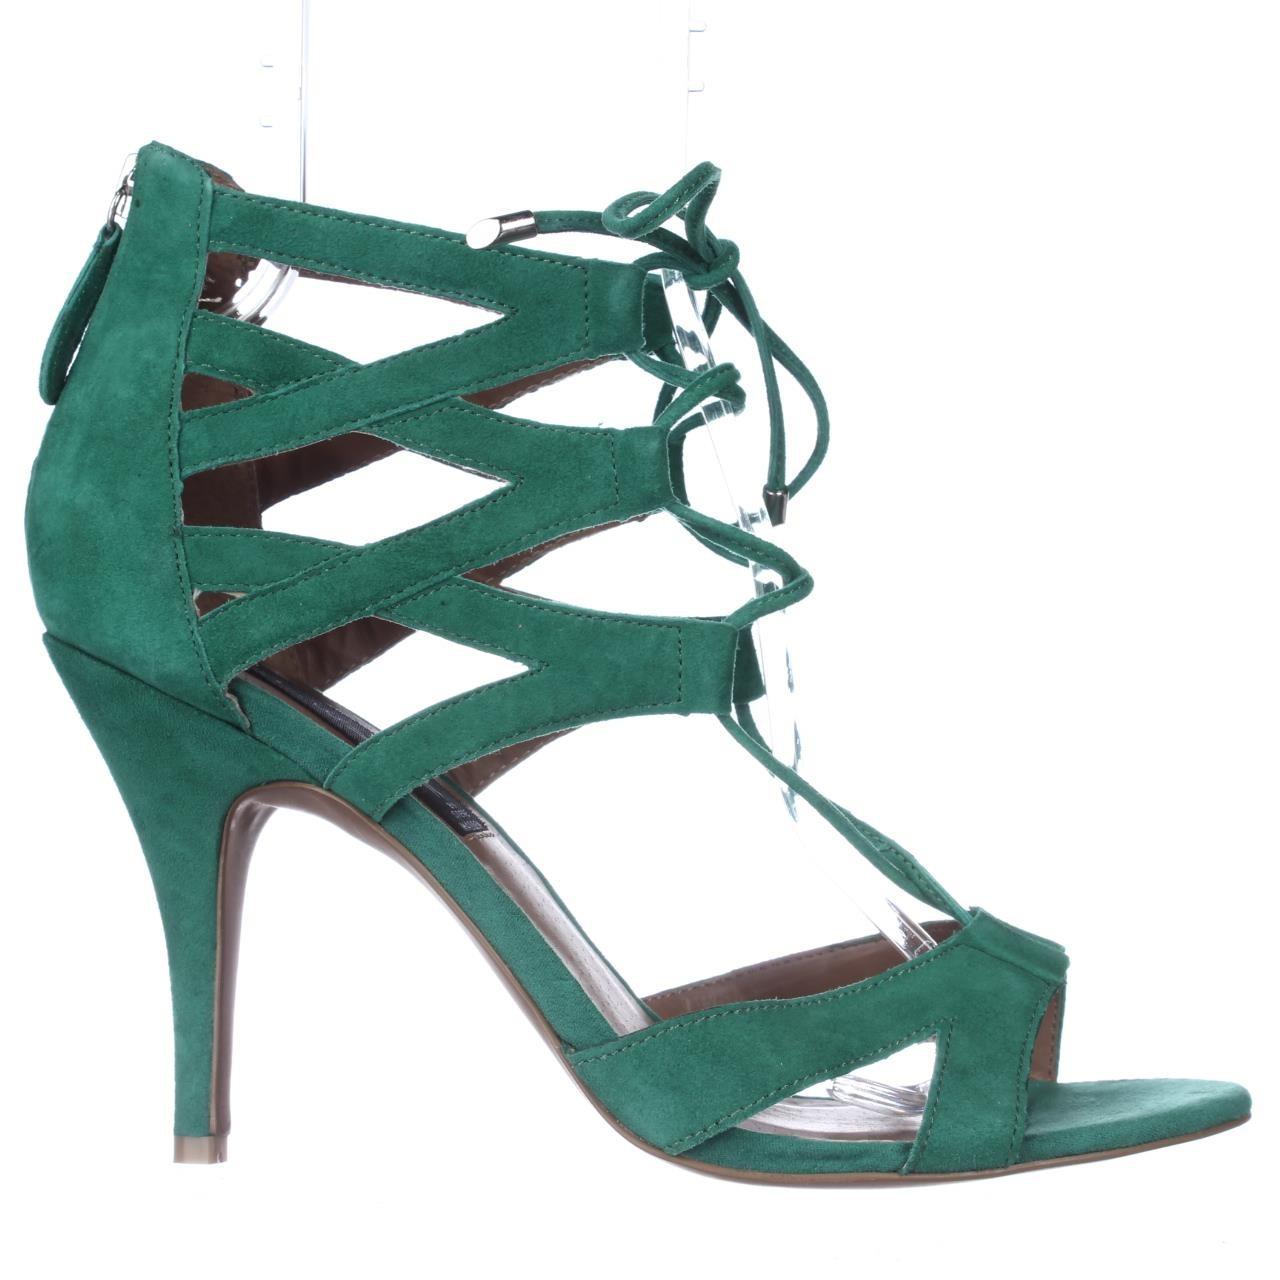 66e23f808b1 Lyst - Steve Madden Steven Gingir Lace-up Dress Sandals in Green